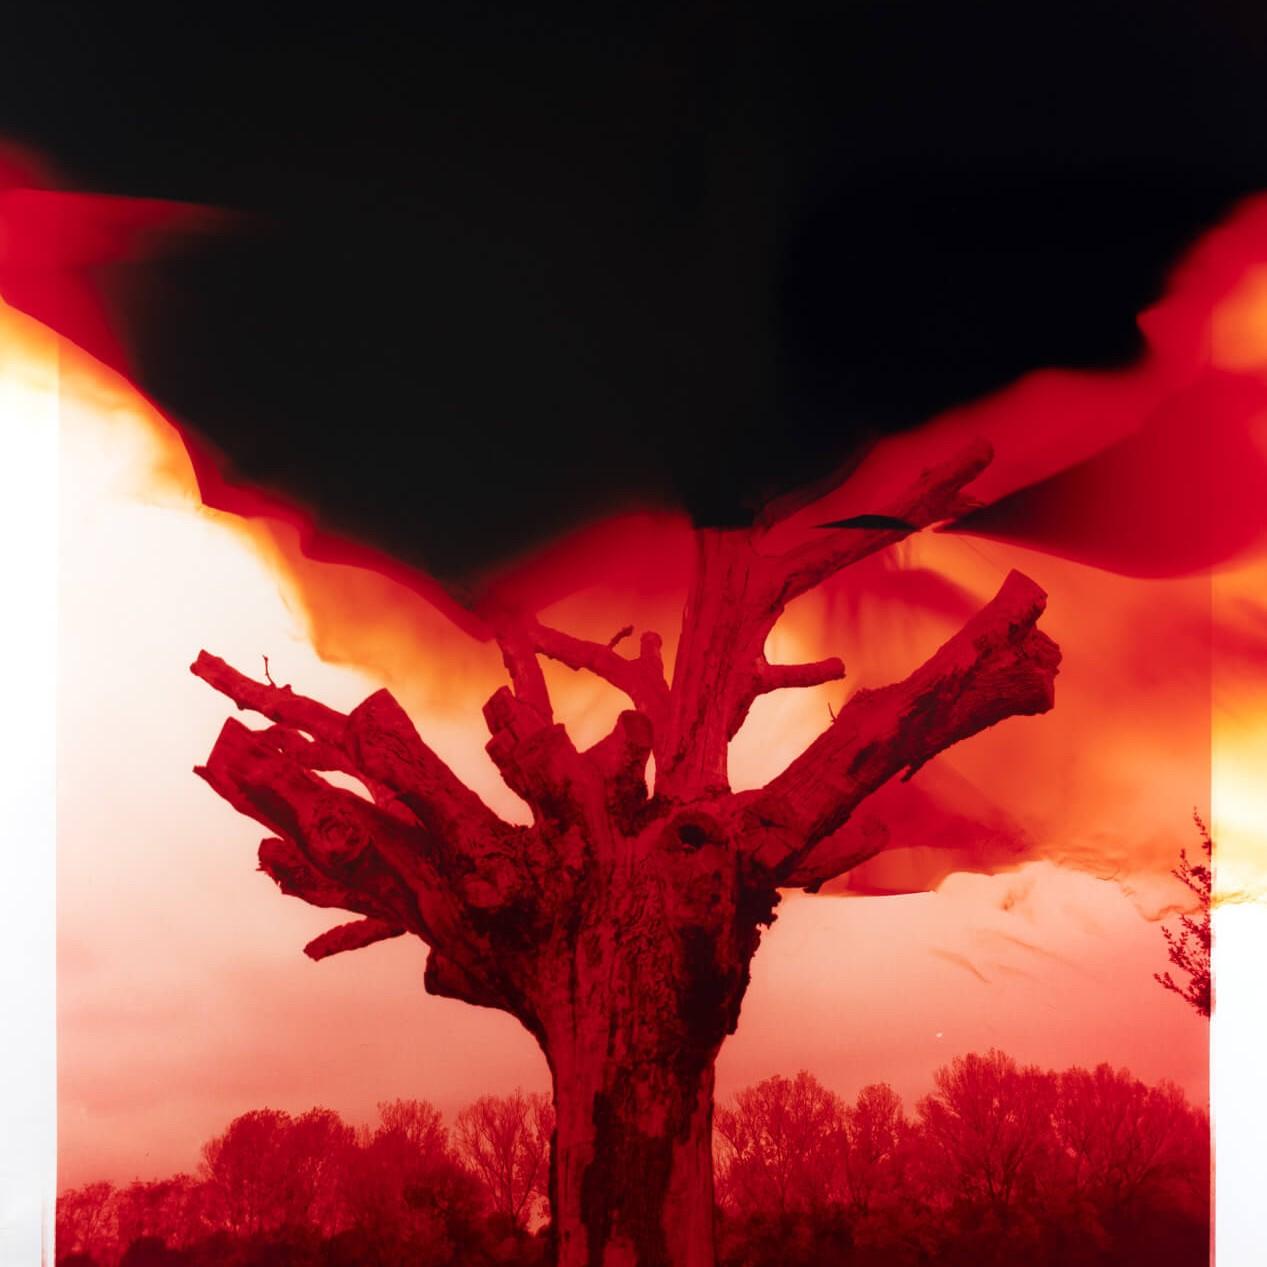 red tree dark room print fading away